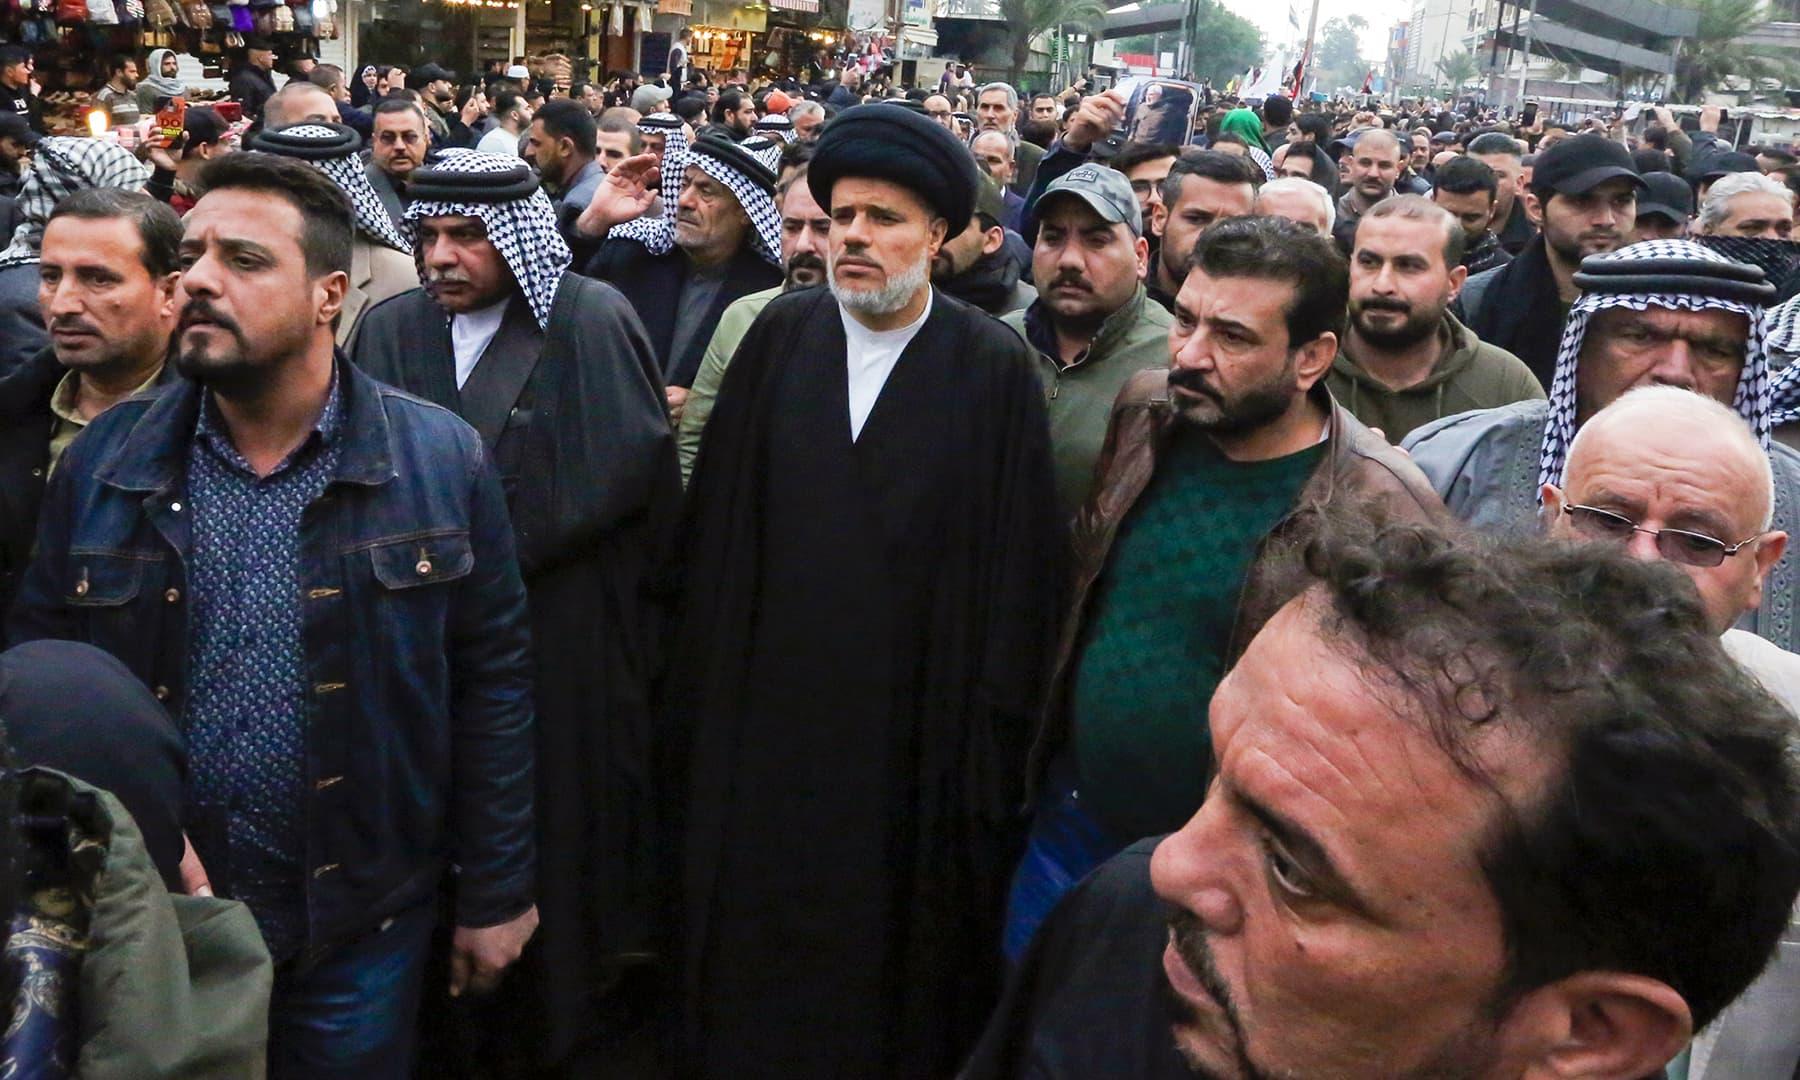 Mohammed al-Tabatabai (C), deputy Secretary General of the Asaib Ahl al-Haq faction, attends the funeral, in Kadhimiya, on January 4. — AFP